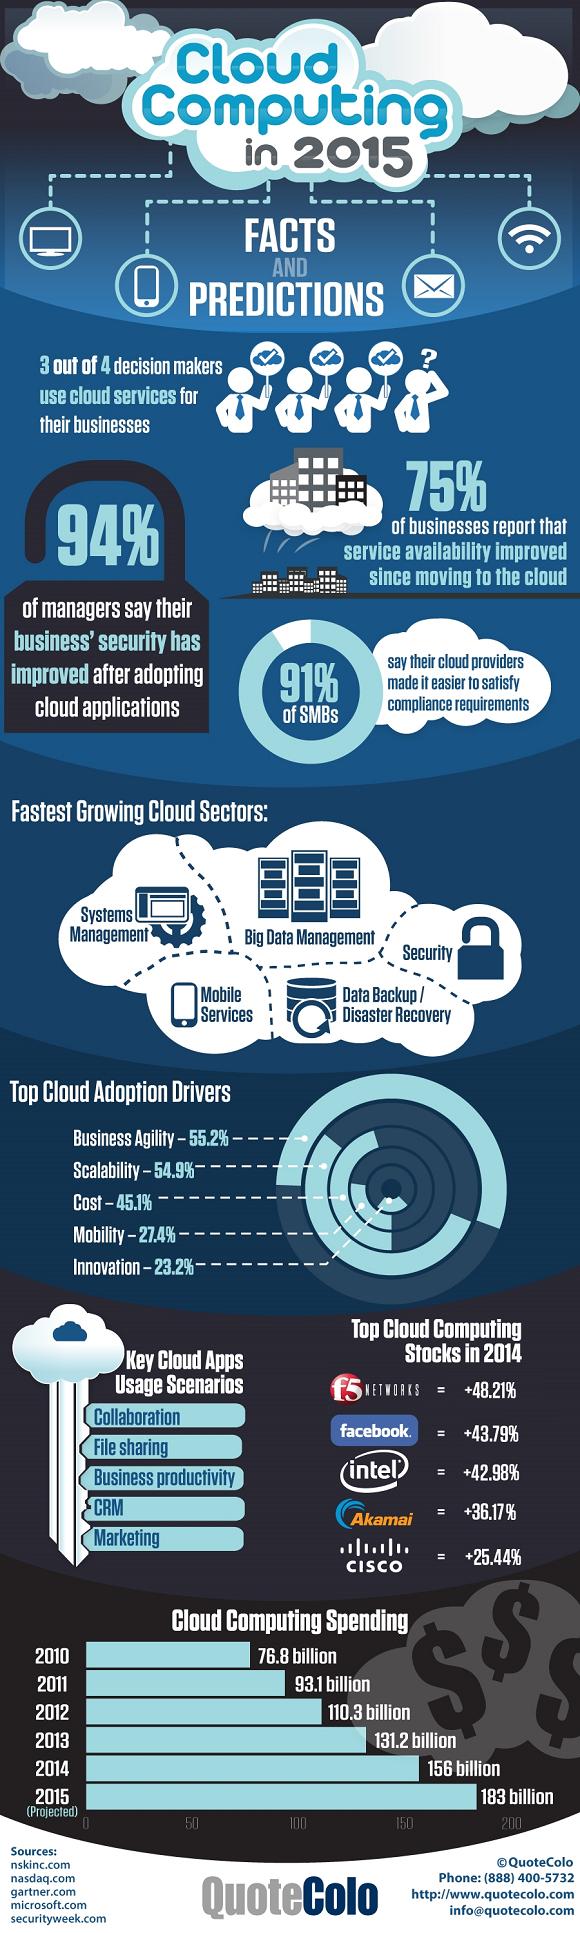 Le 8 cose da sapere assolutamente sul cloud computing 2015